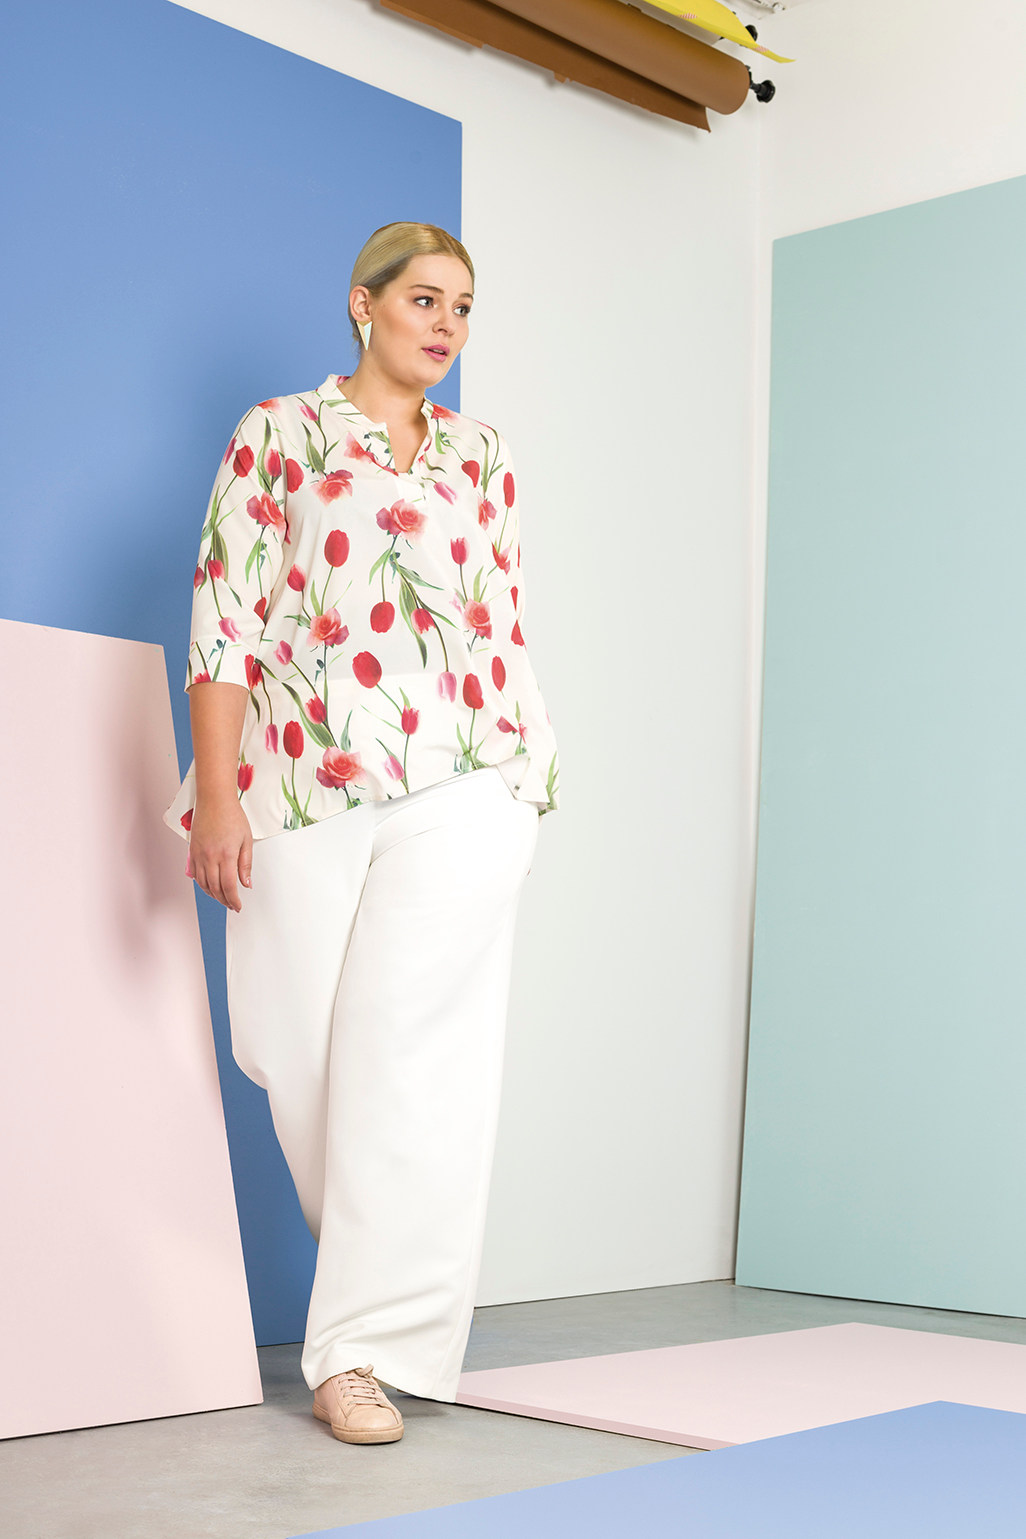 Fashion_Editorial_PlusSizeSS18_3.jpg